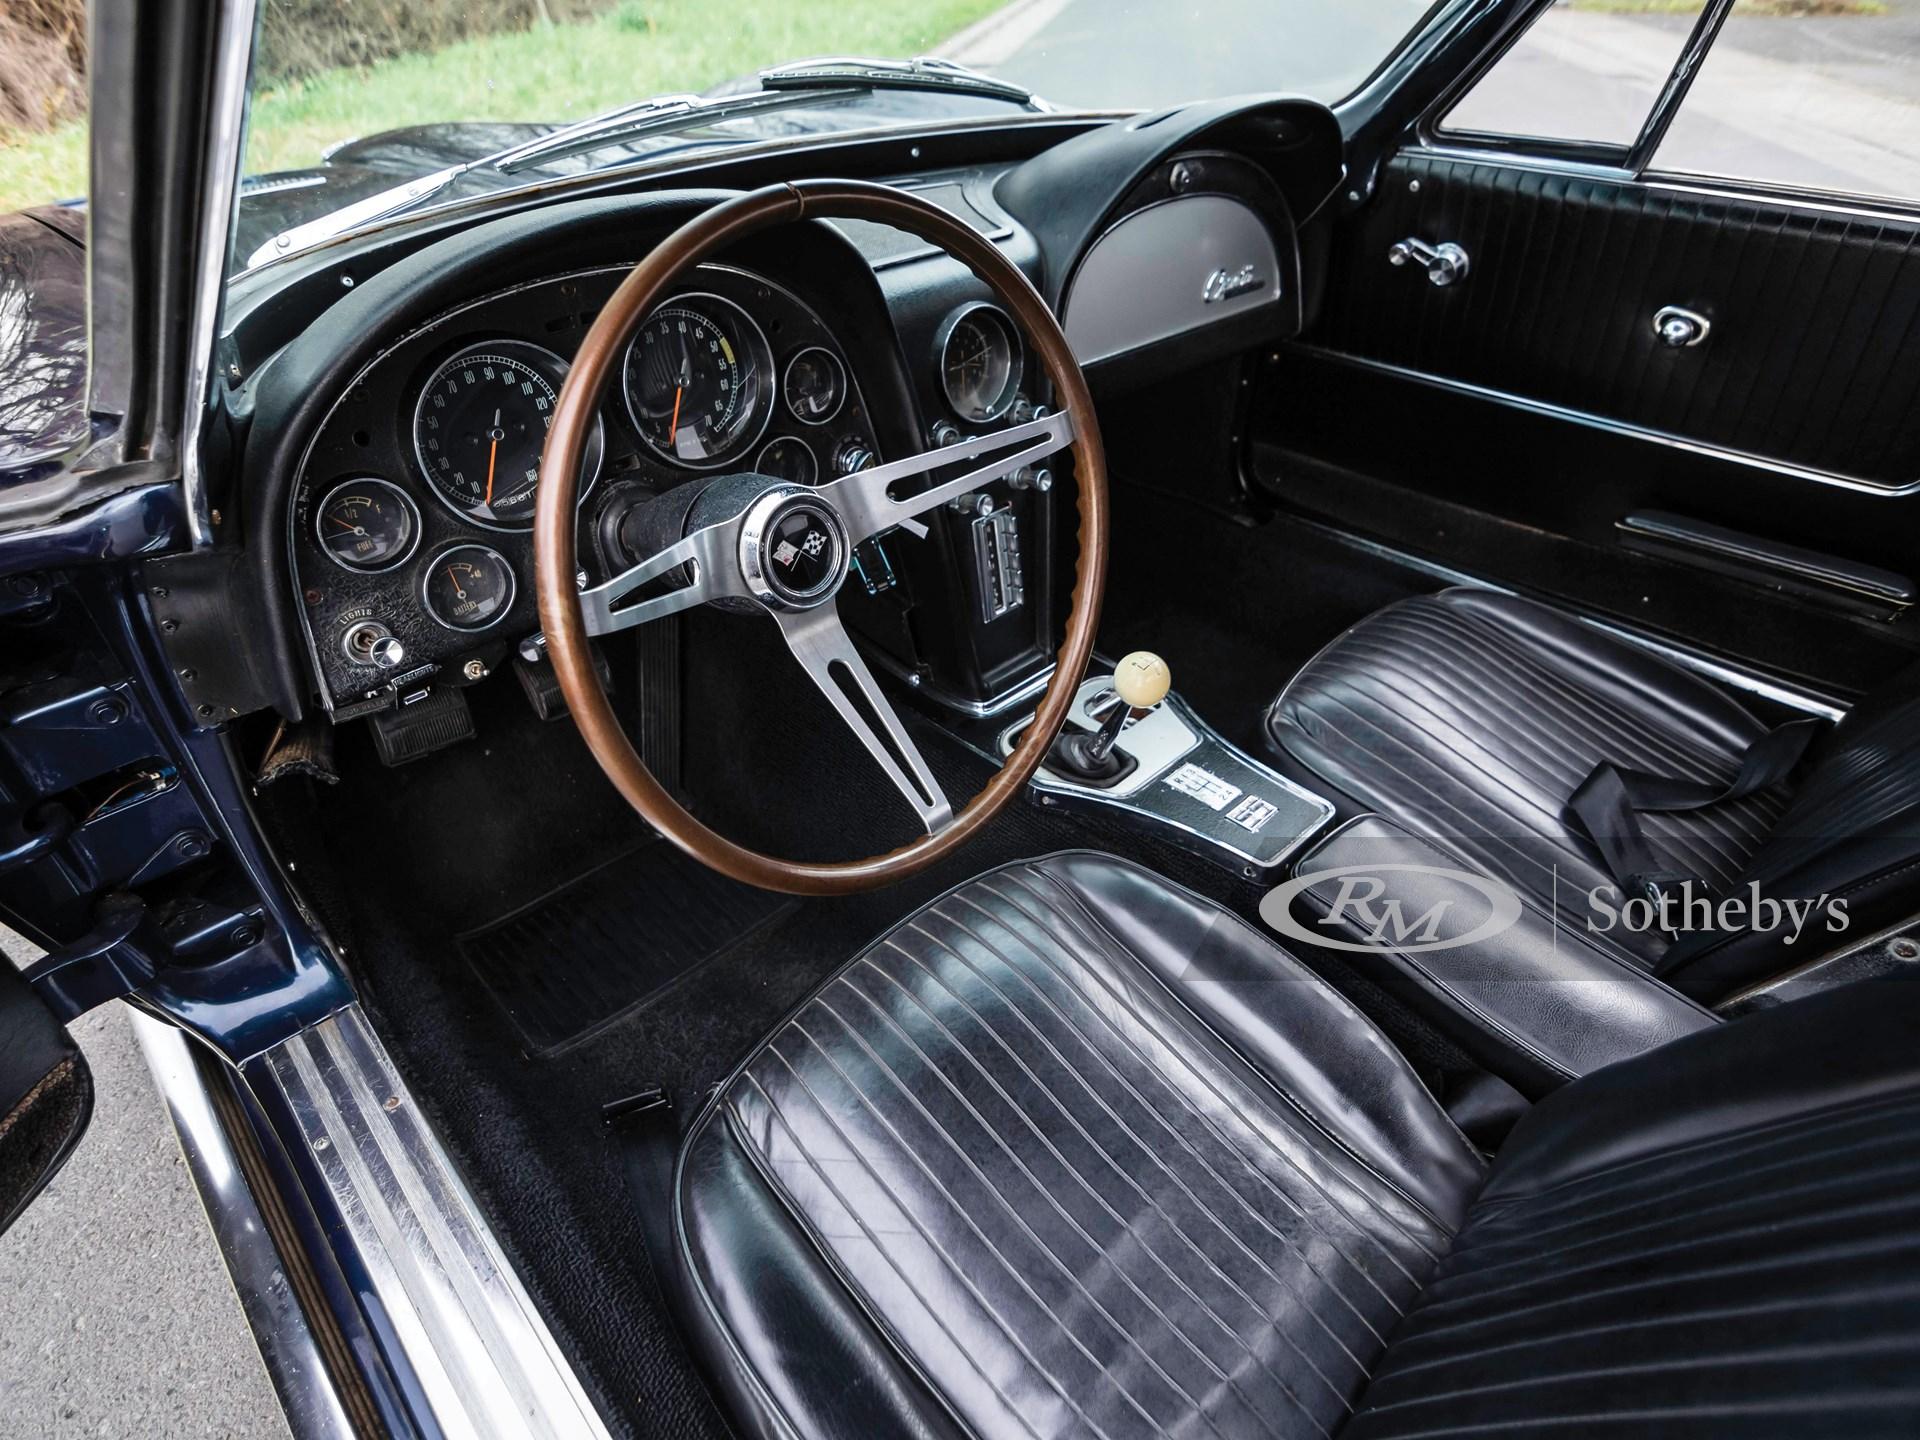 1963 Chevrolet Corvette Sting Ray Convertible  -